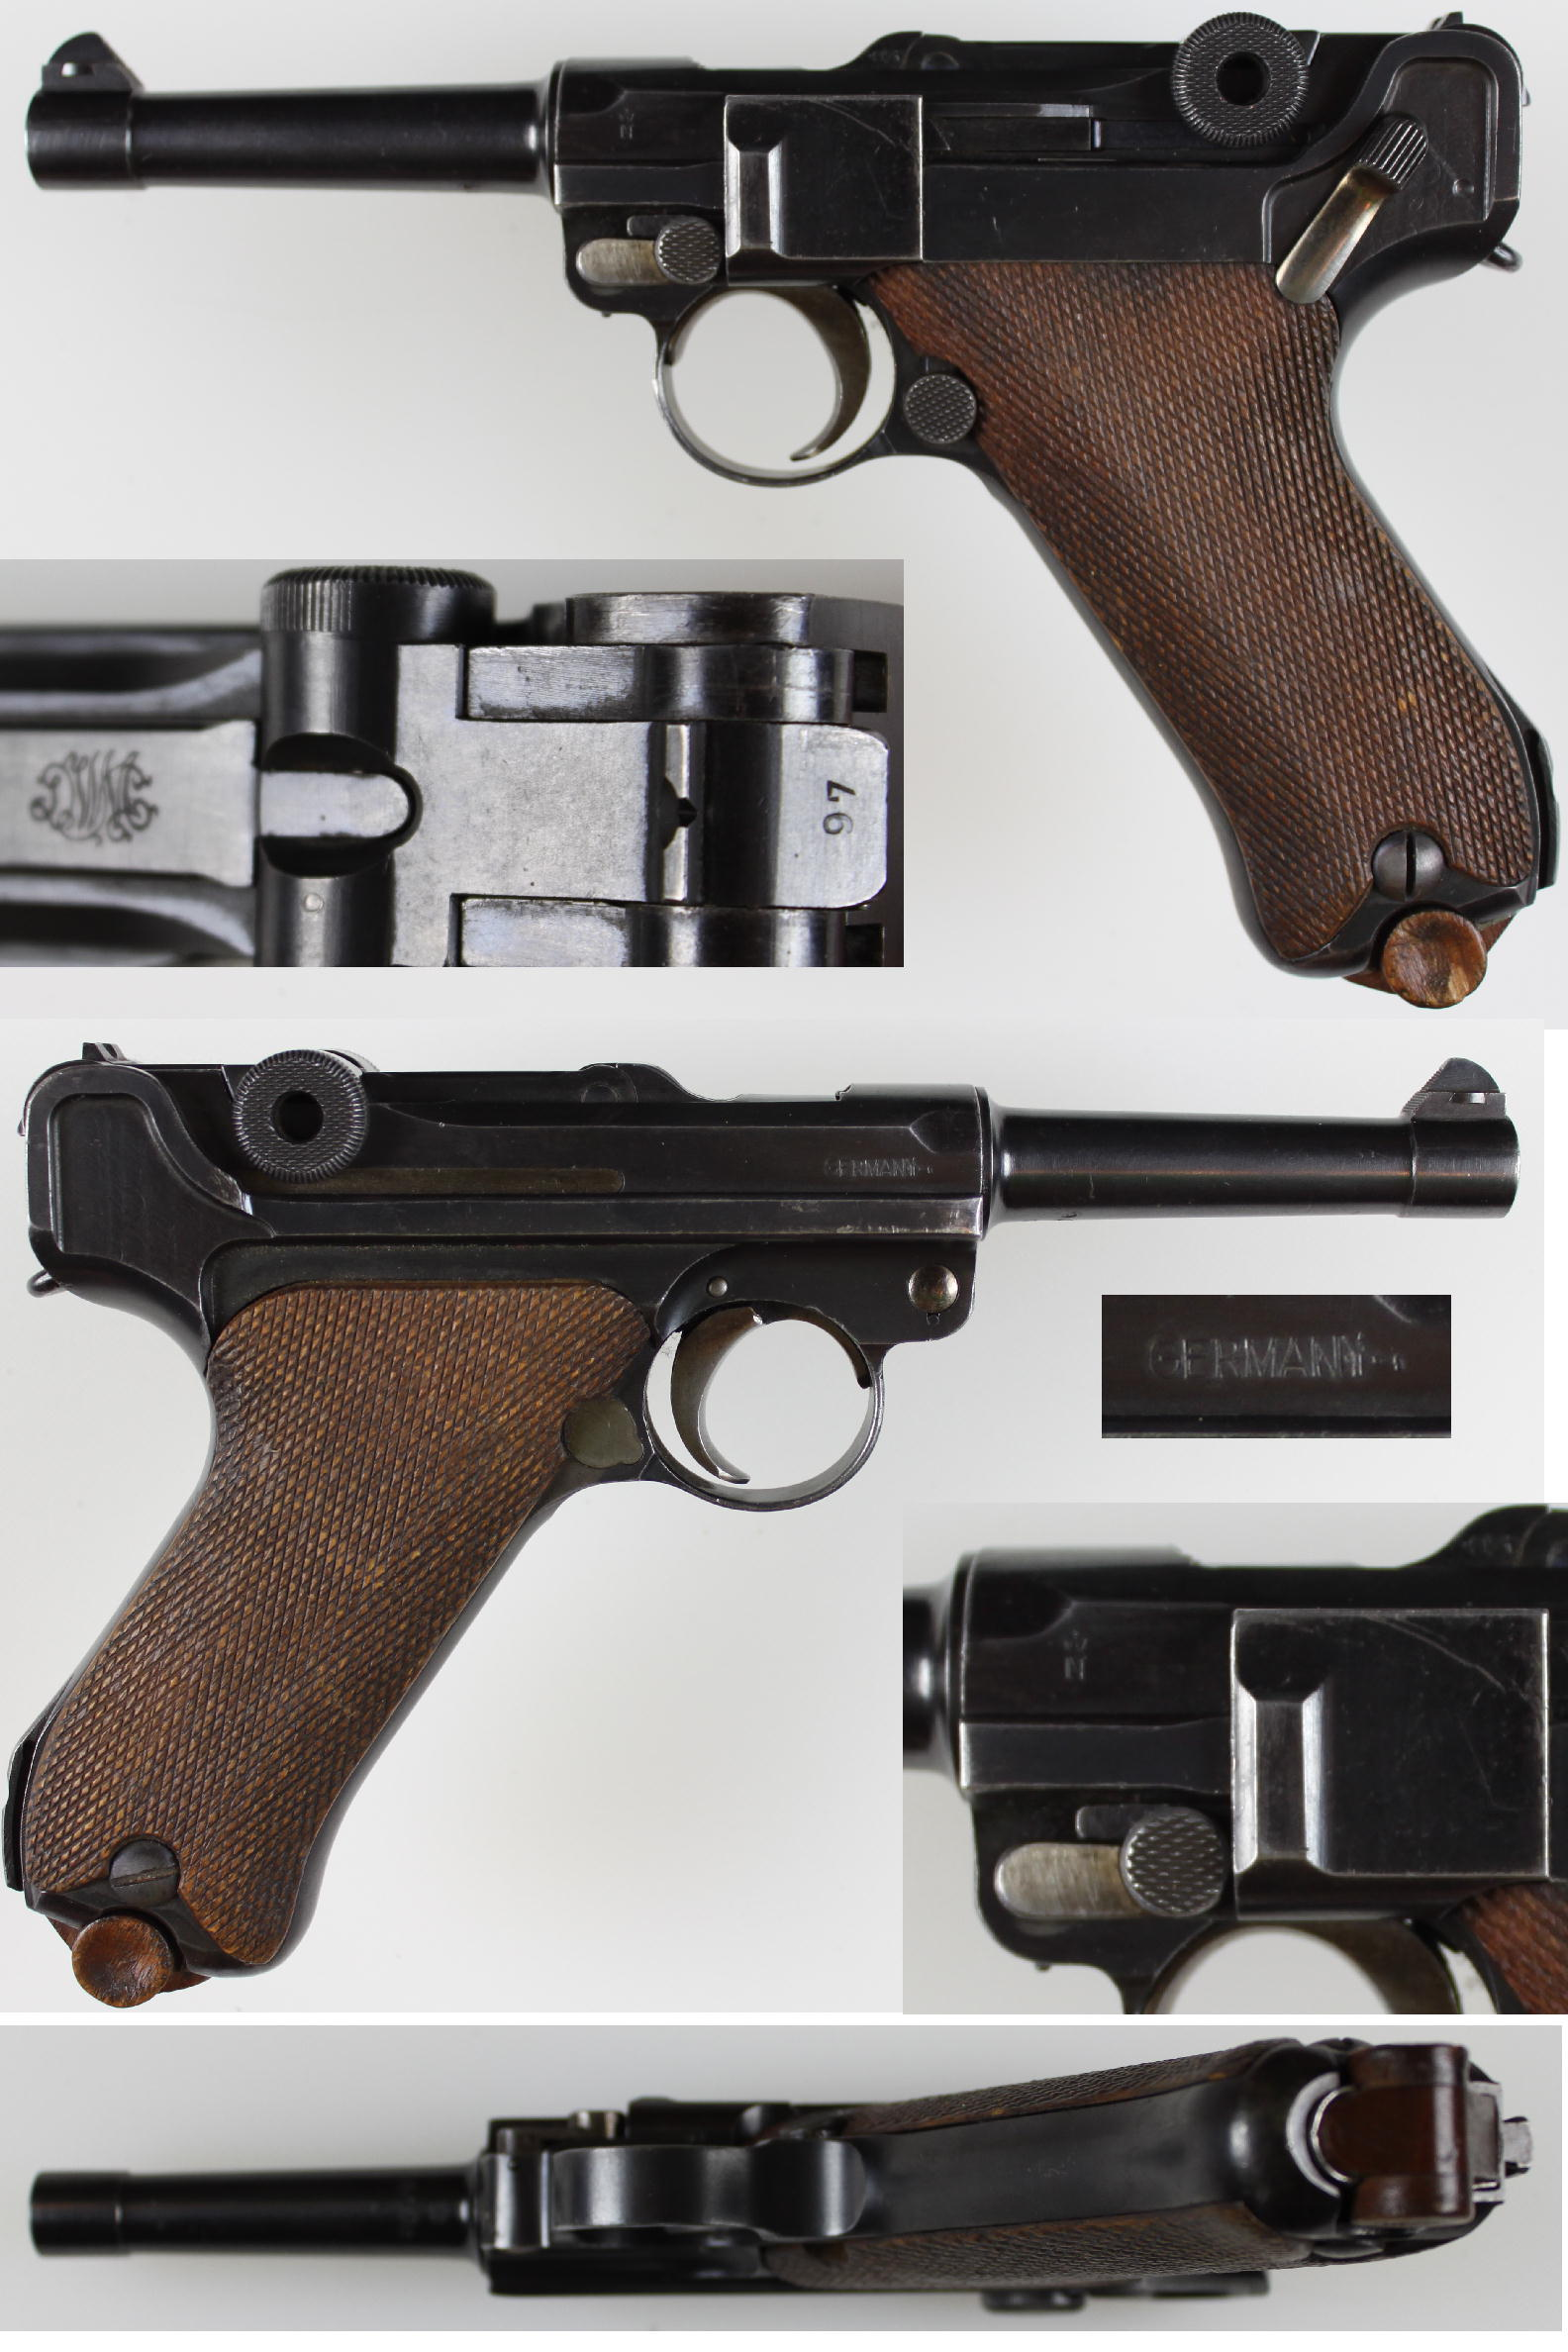 P08 Luger Parabellum Items For Sale